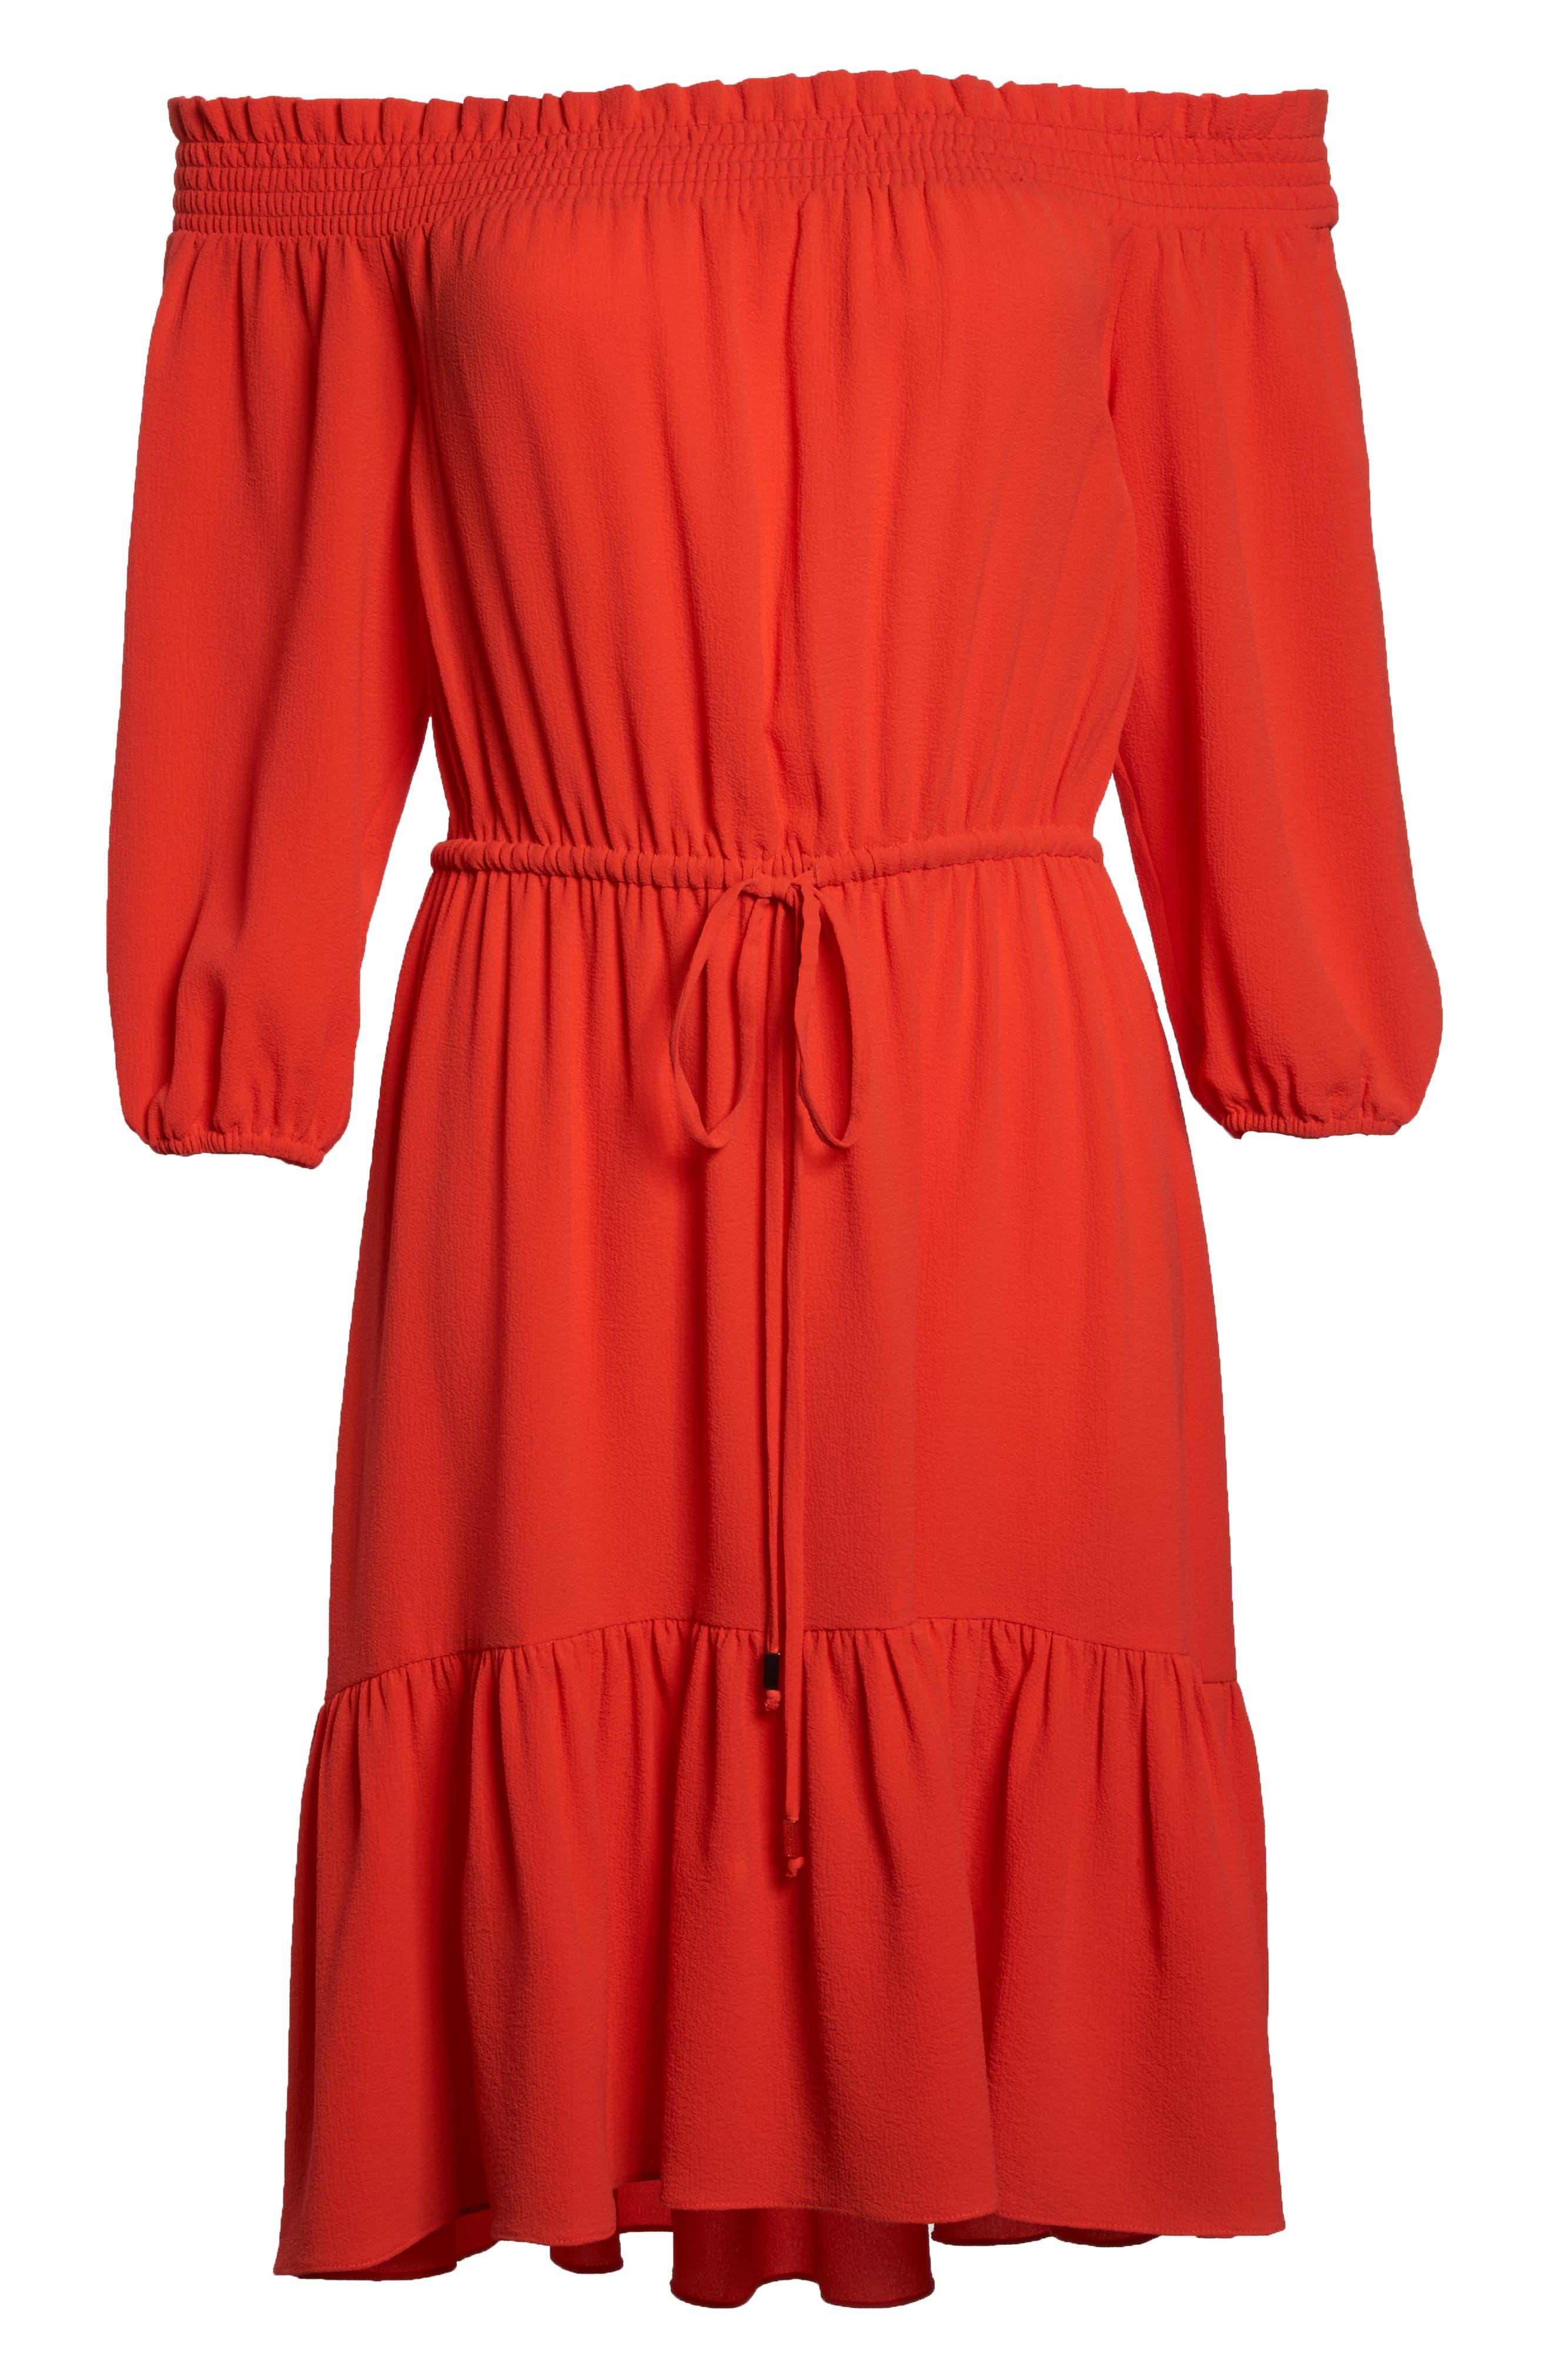 Off the Shoulder Crepe Dress,                             Alternate thumbnail 6, color,                             952